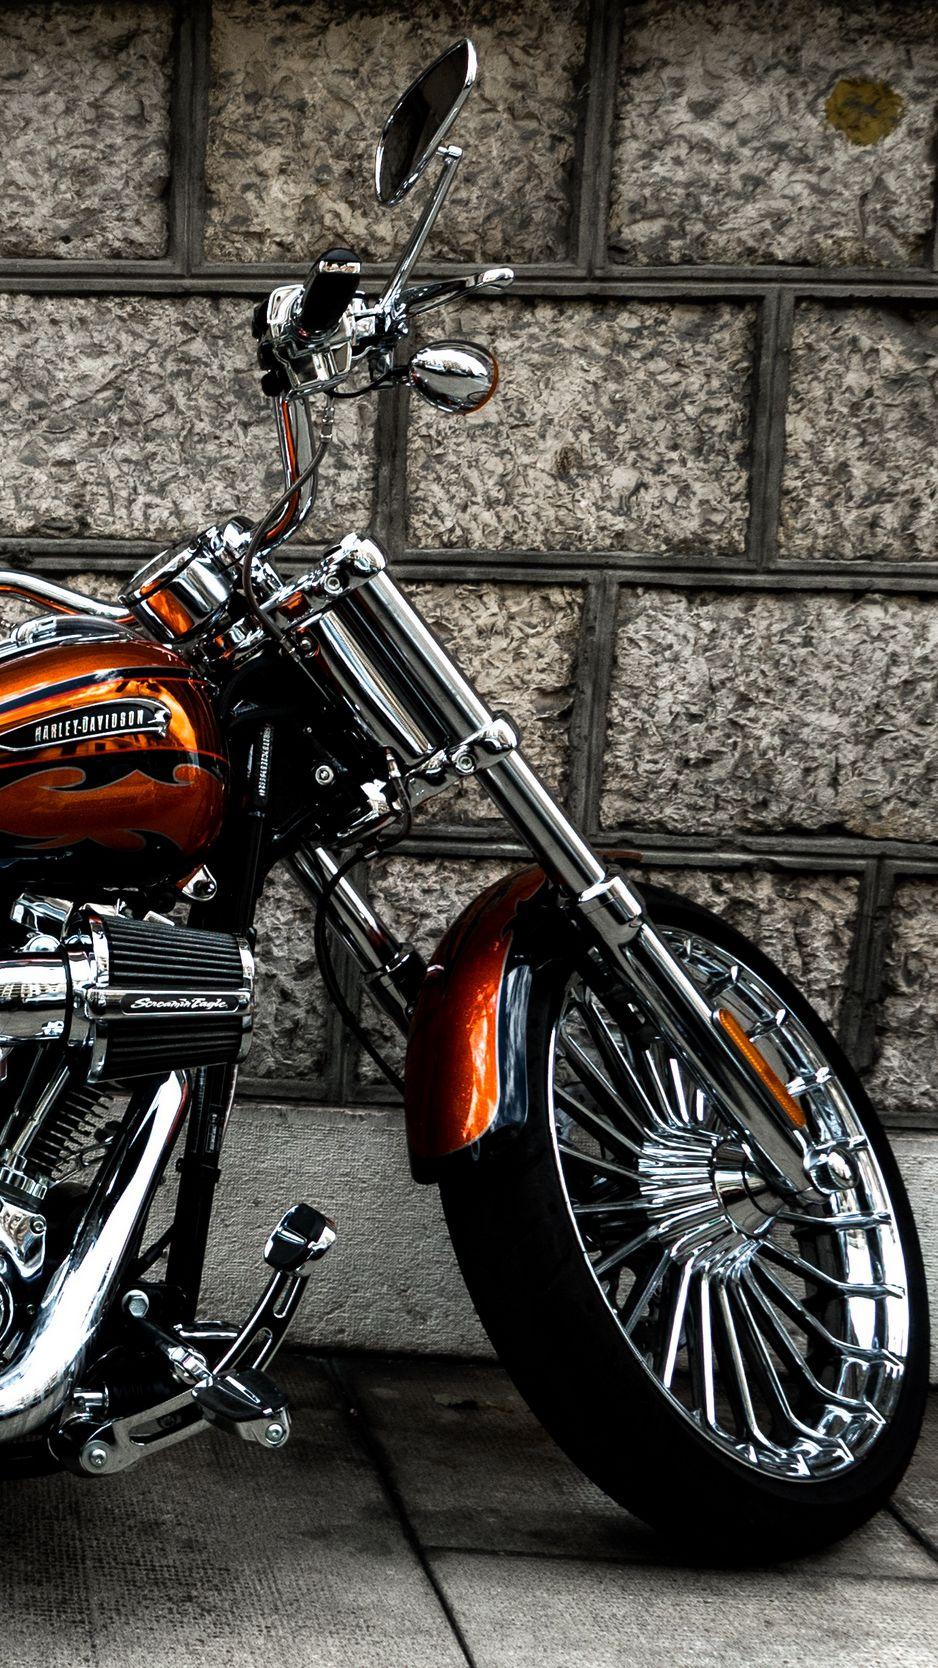 938x1668 Wallpaper motorcycle, bike, side view, wheel